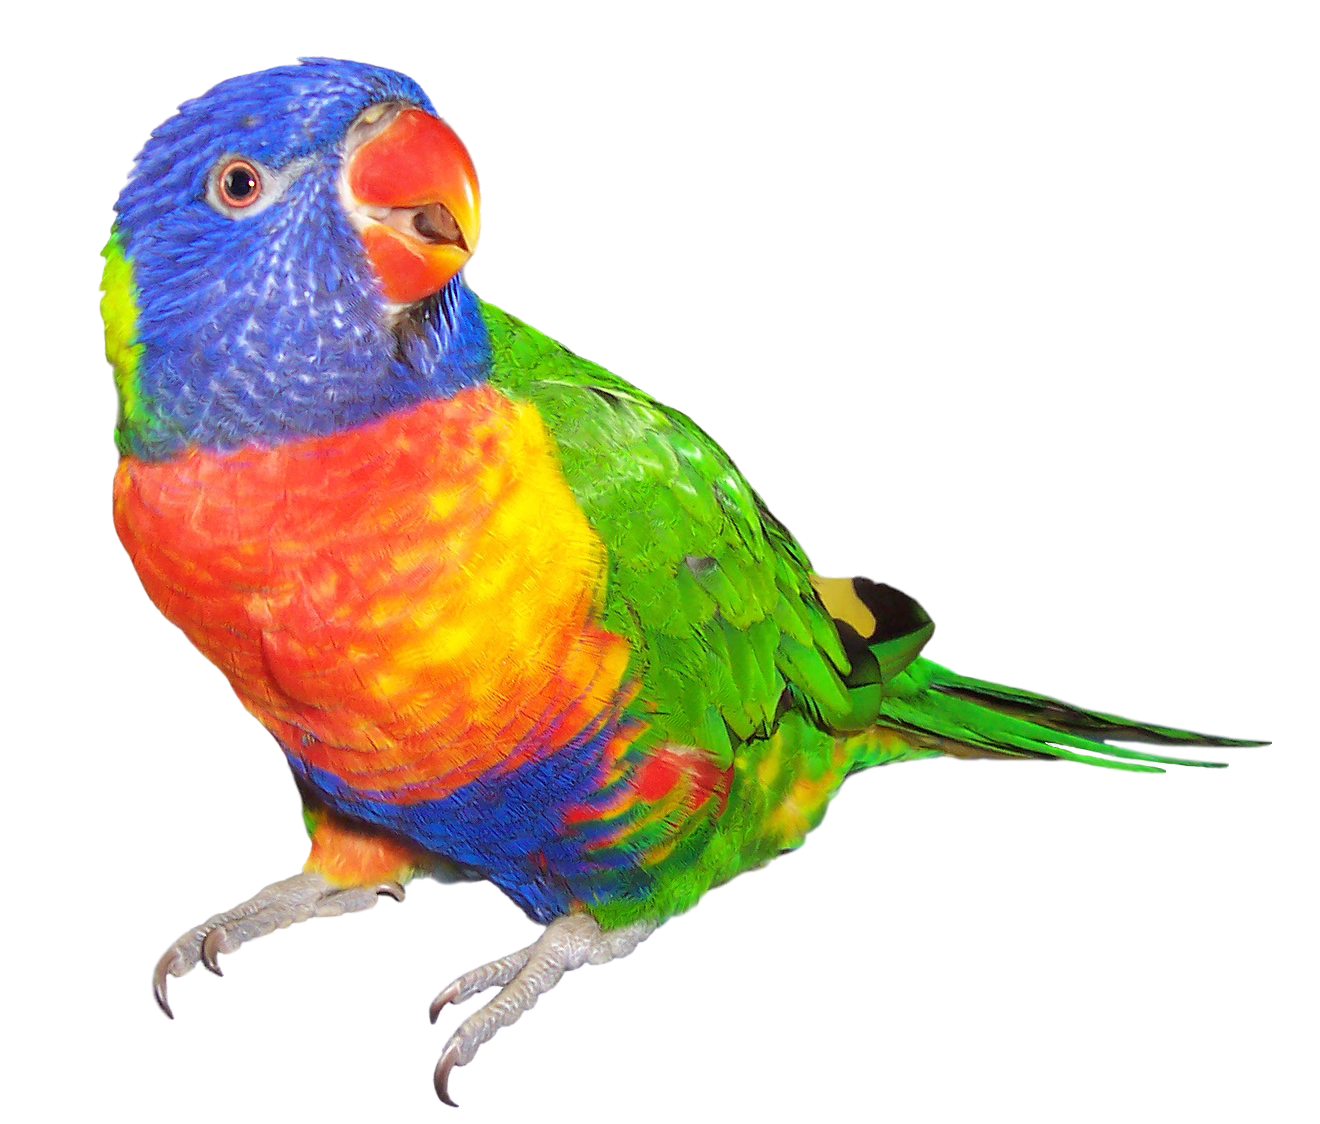 Rainbow Lorikeet clipart #9, Download drawings